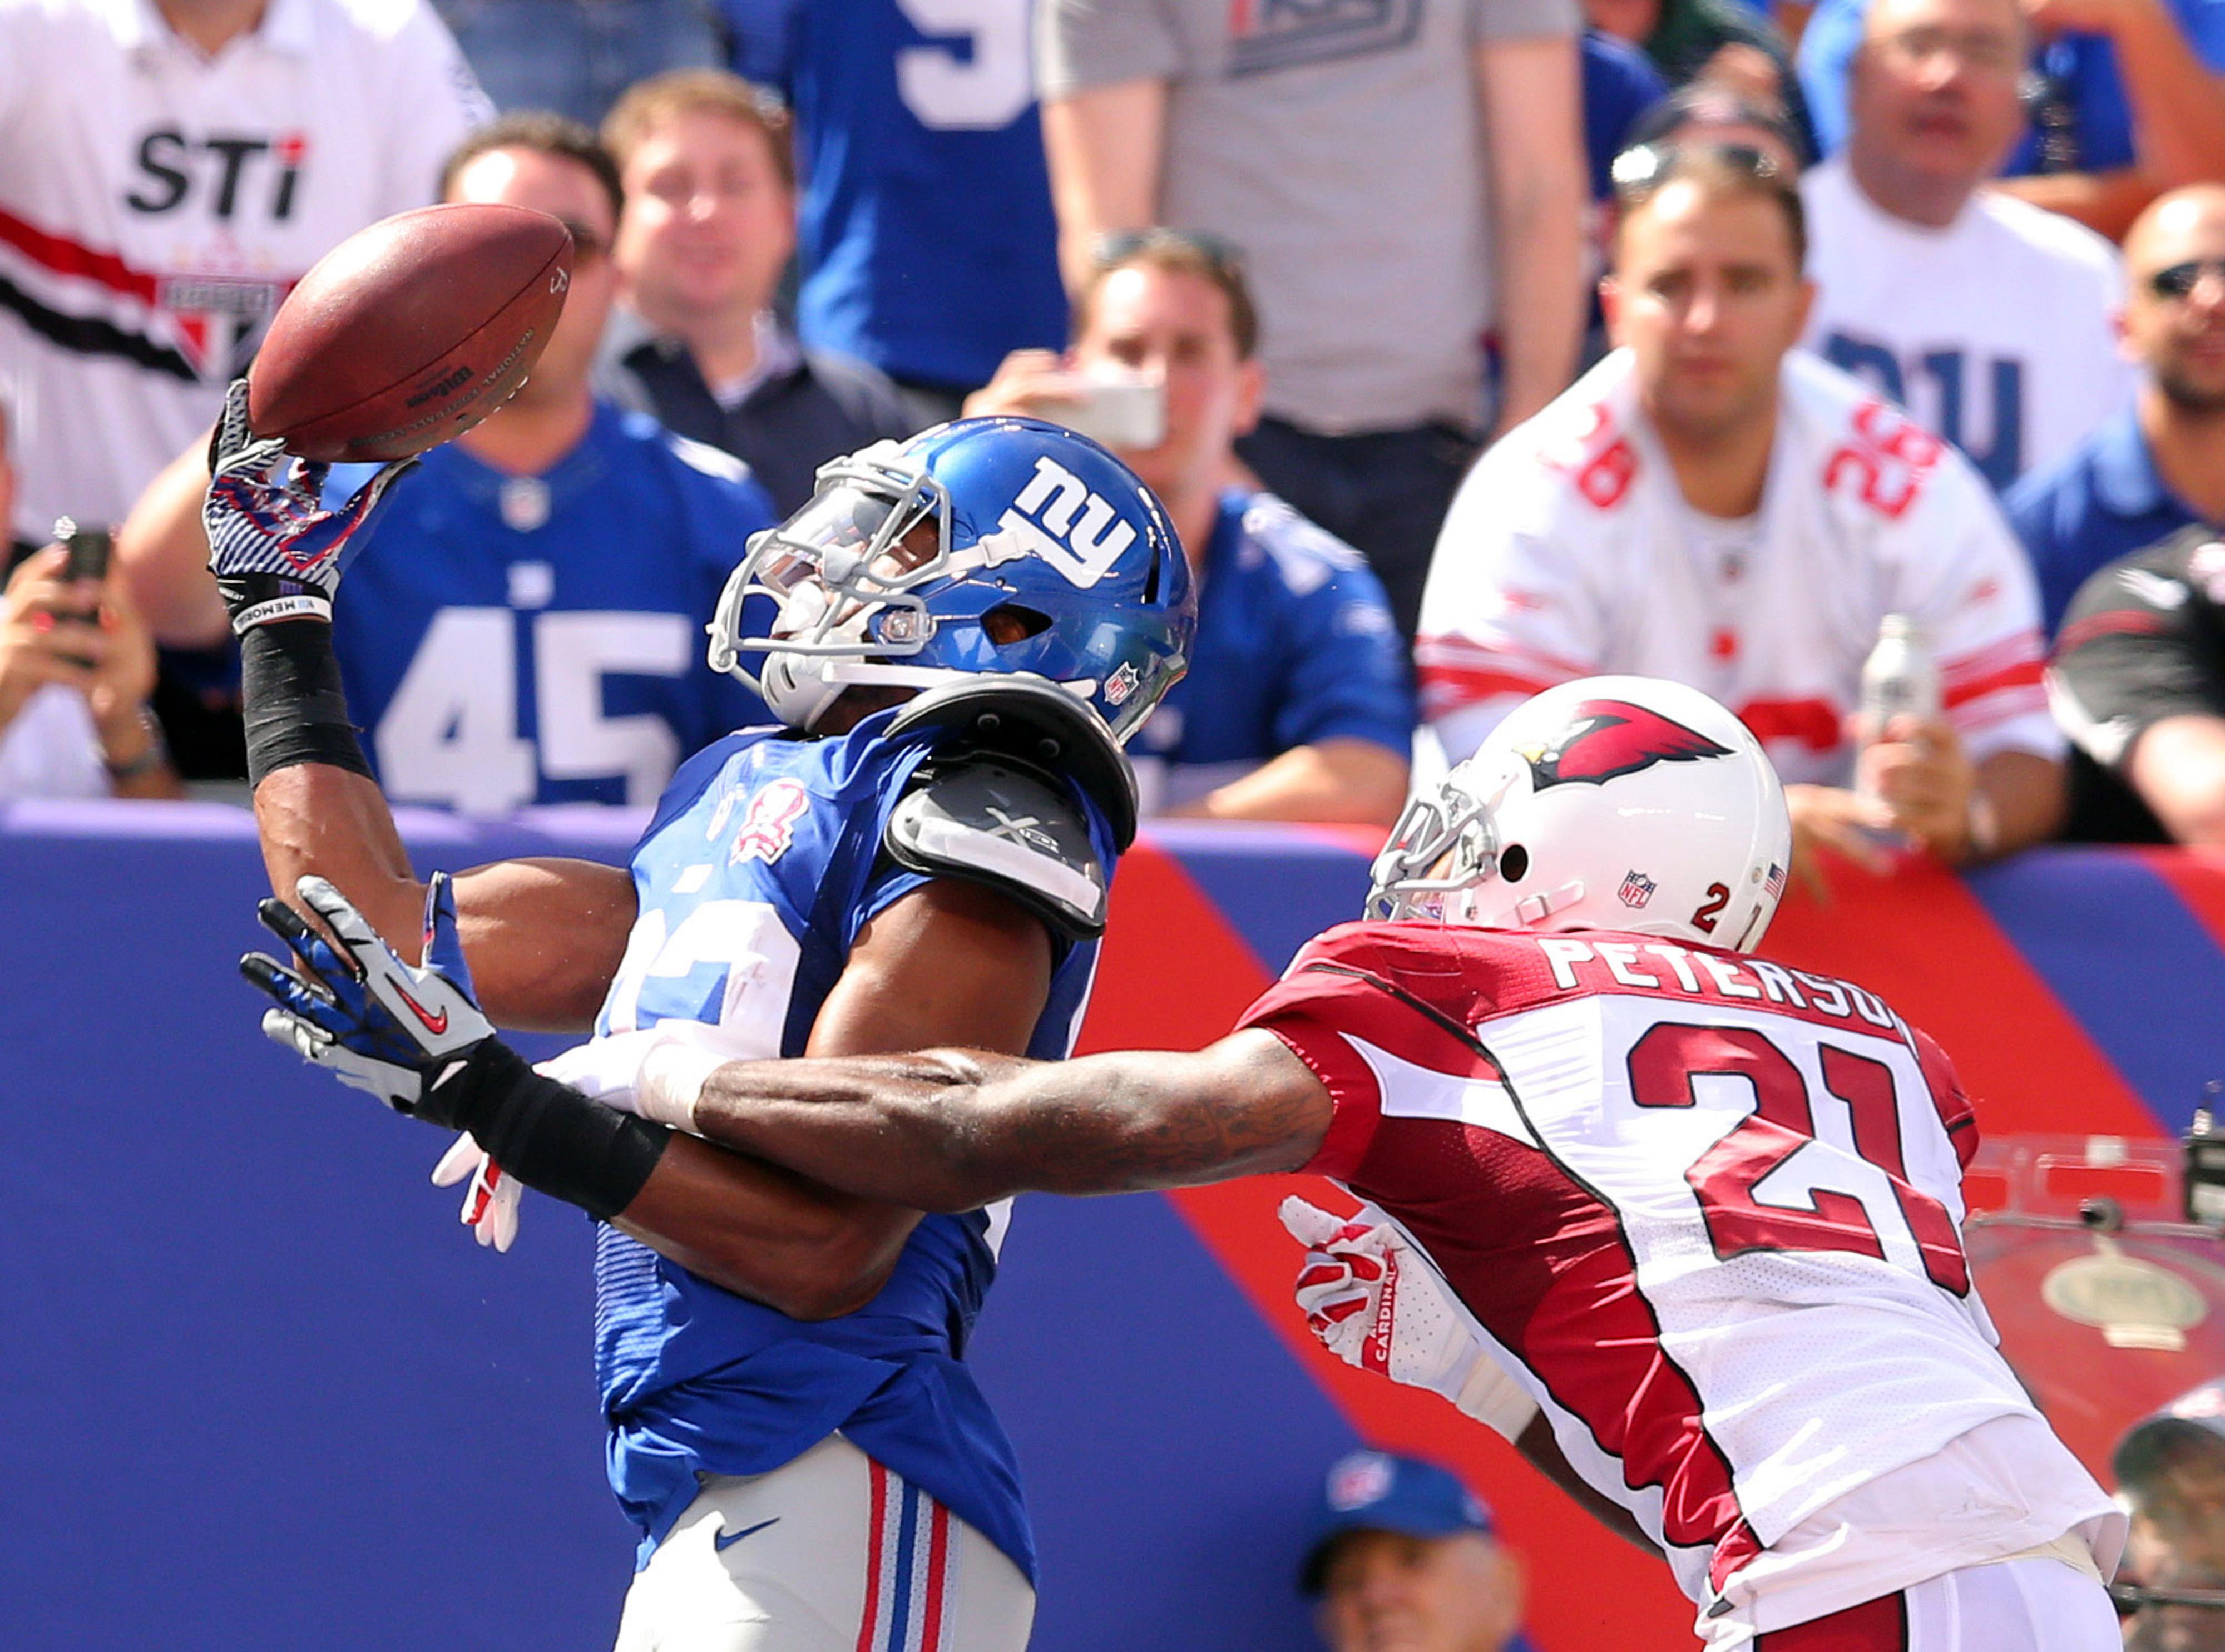 Rueben Randle catches a touchdown pass on Sunday